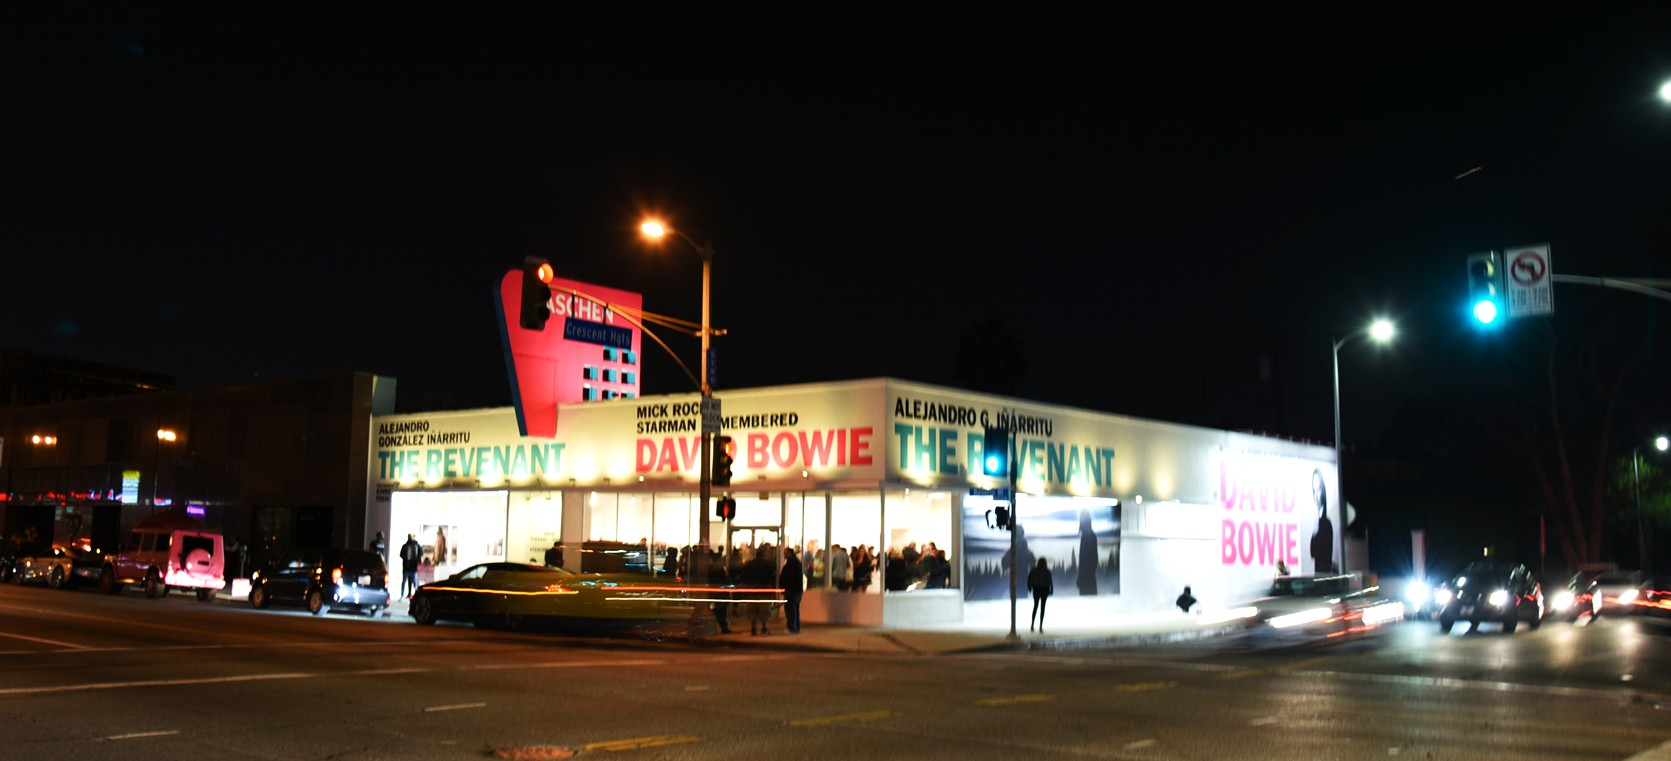 Mick Rock, Revenant, David Bowie, gallery